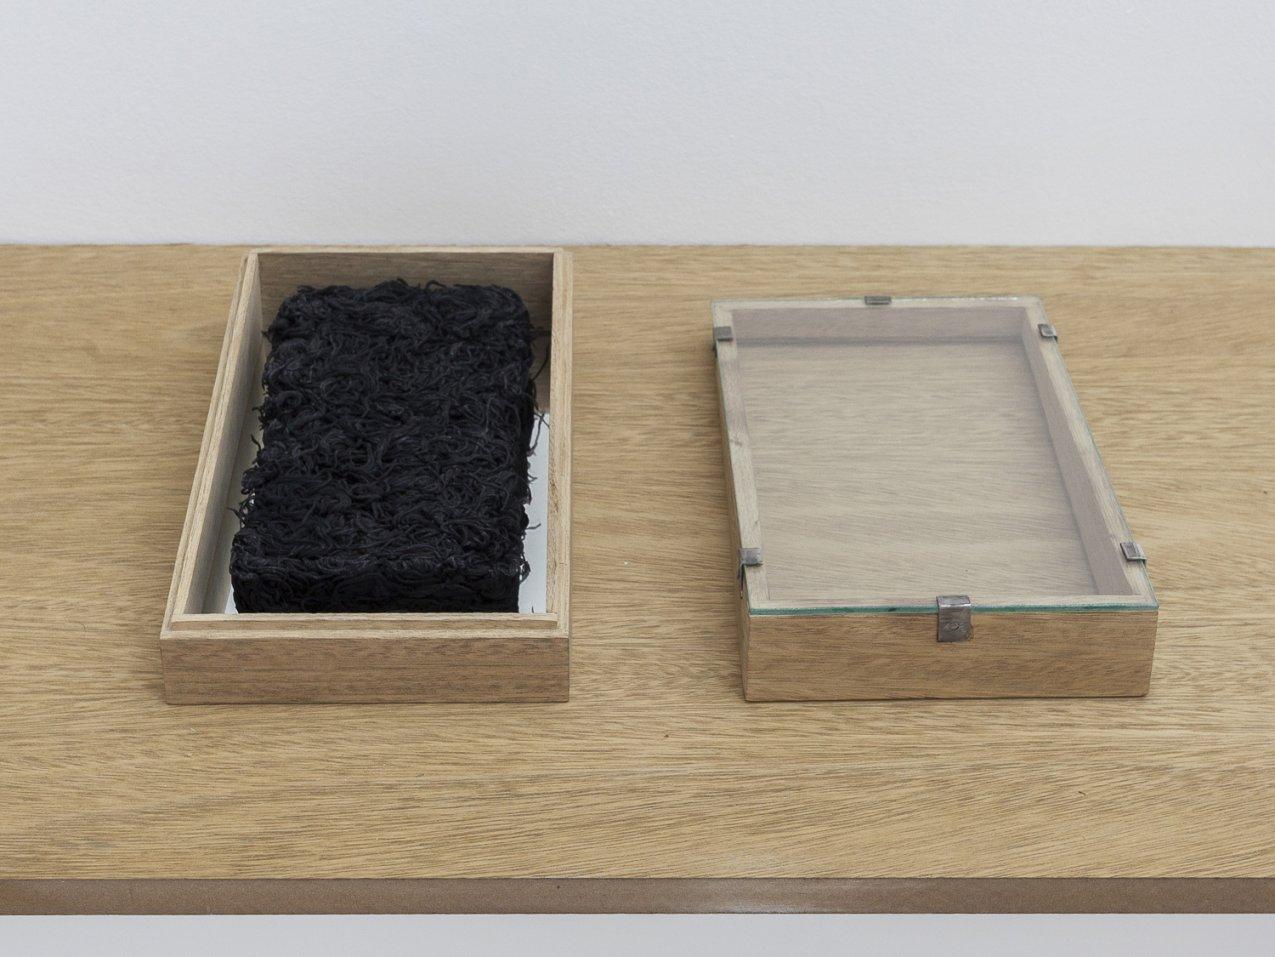 Componente (La Bruja 1) (2017) - Martín Touzon